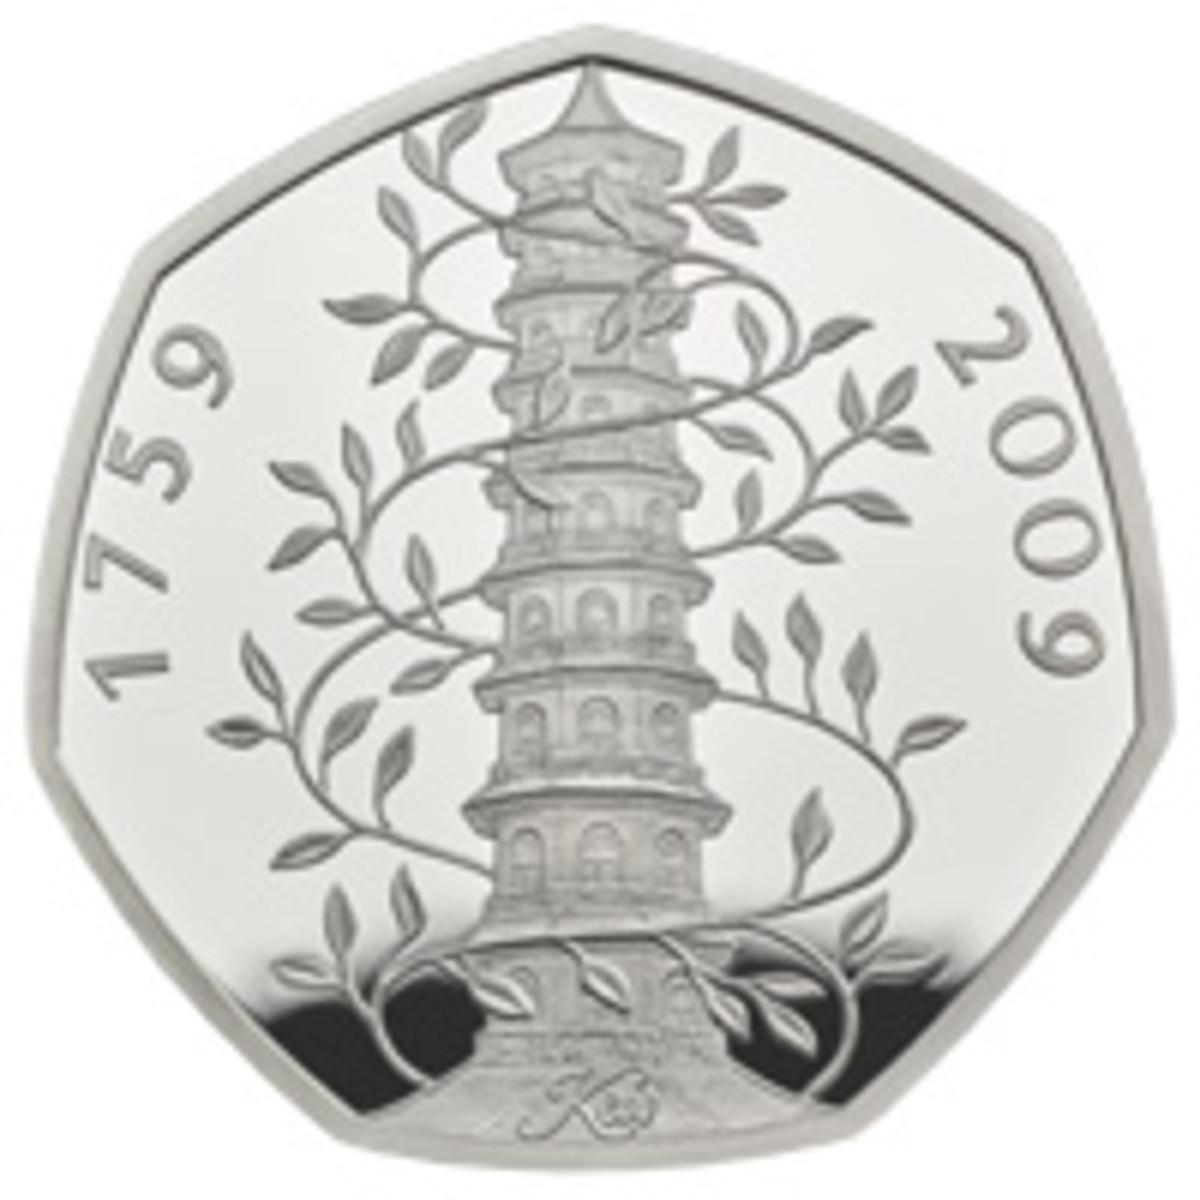 (Image courtesy & © The Royal Mint)